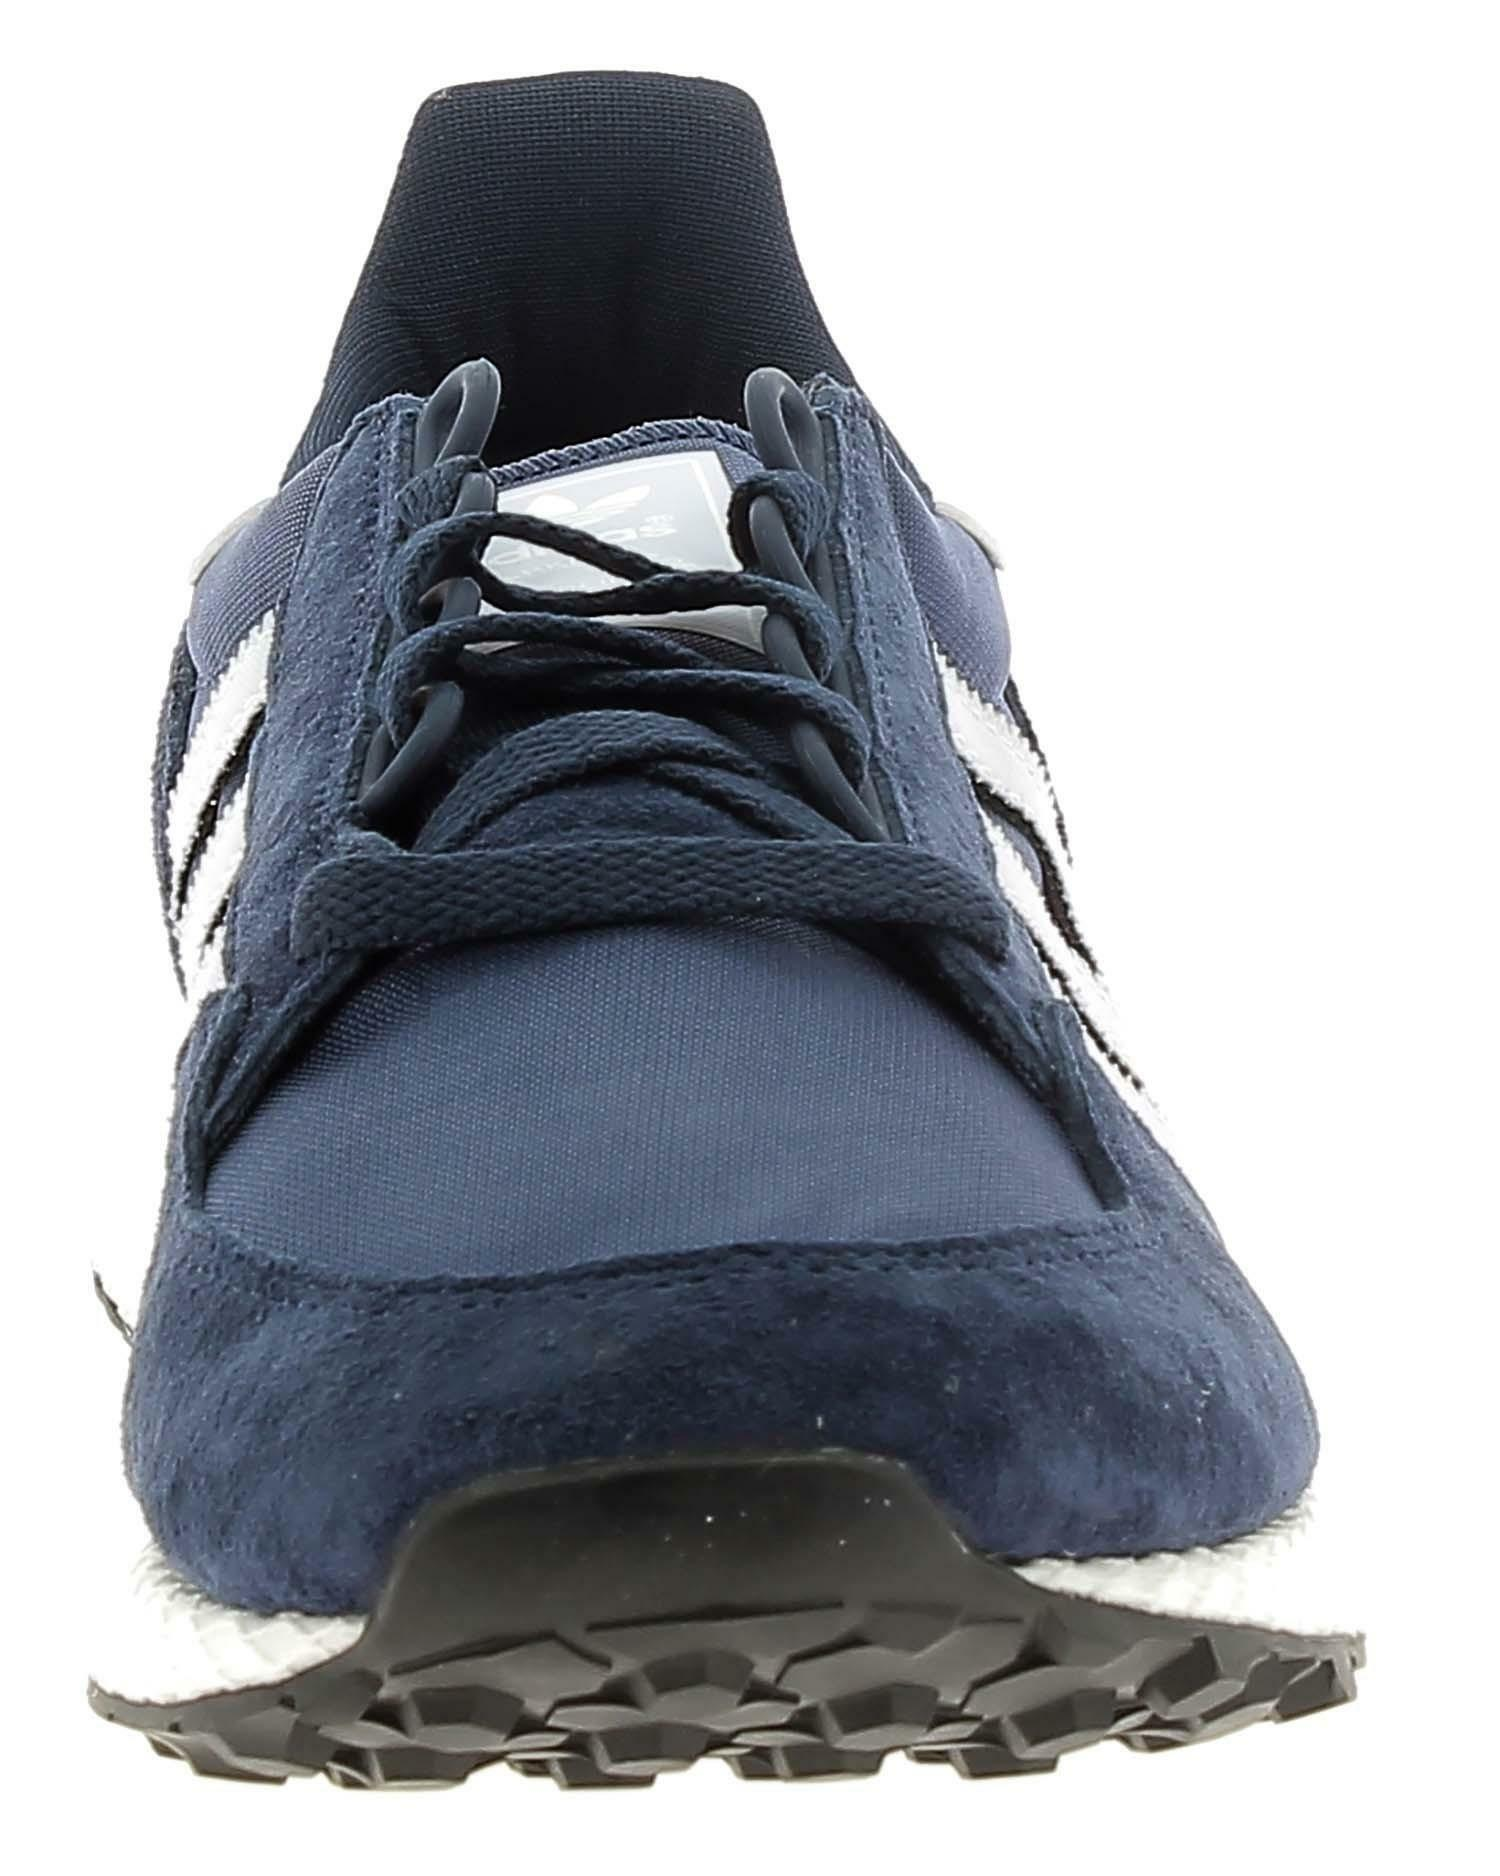 adidas adidas forest grove scarpa sportiva uomo blu d96630